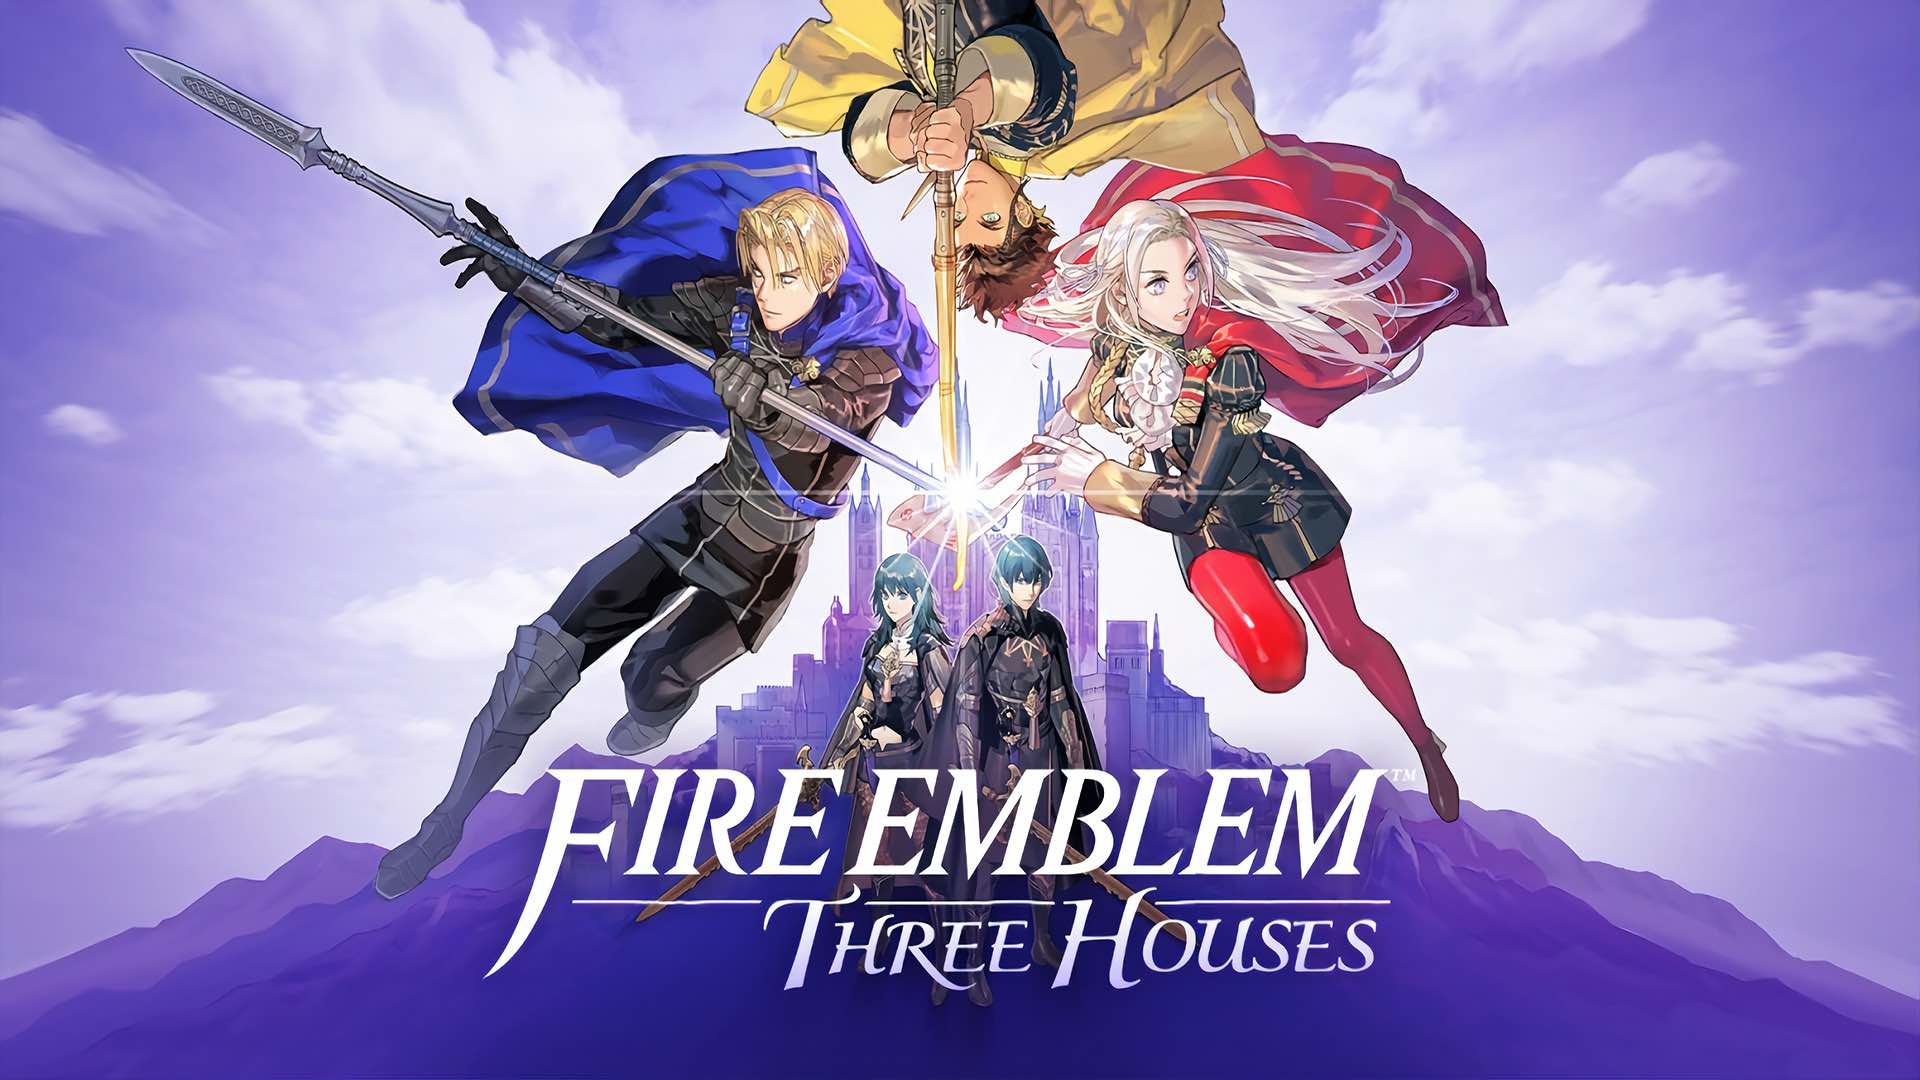 Fire Emblem Offer Appears In Famitsu